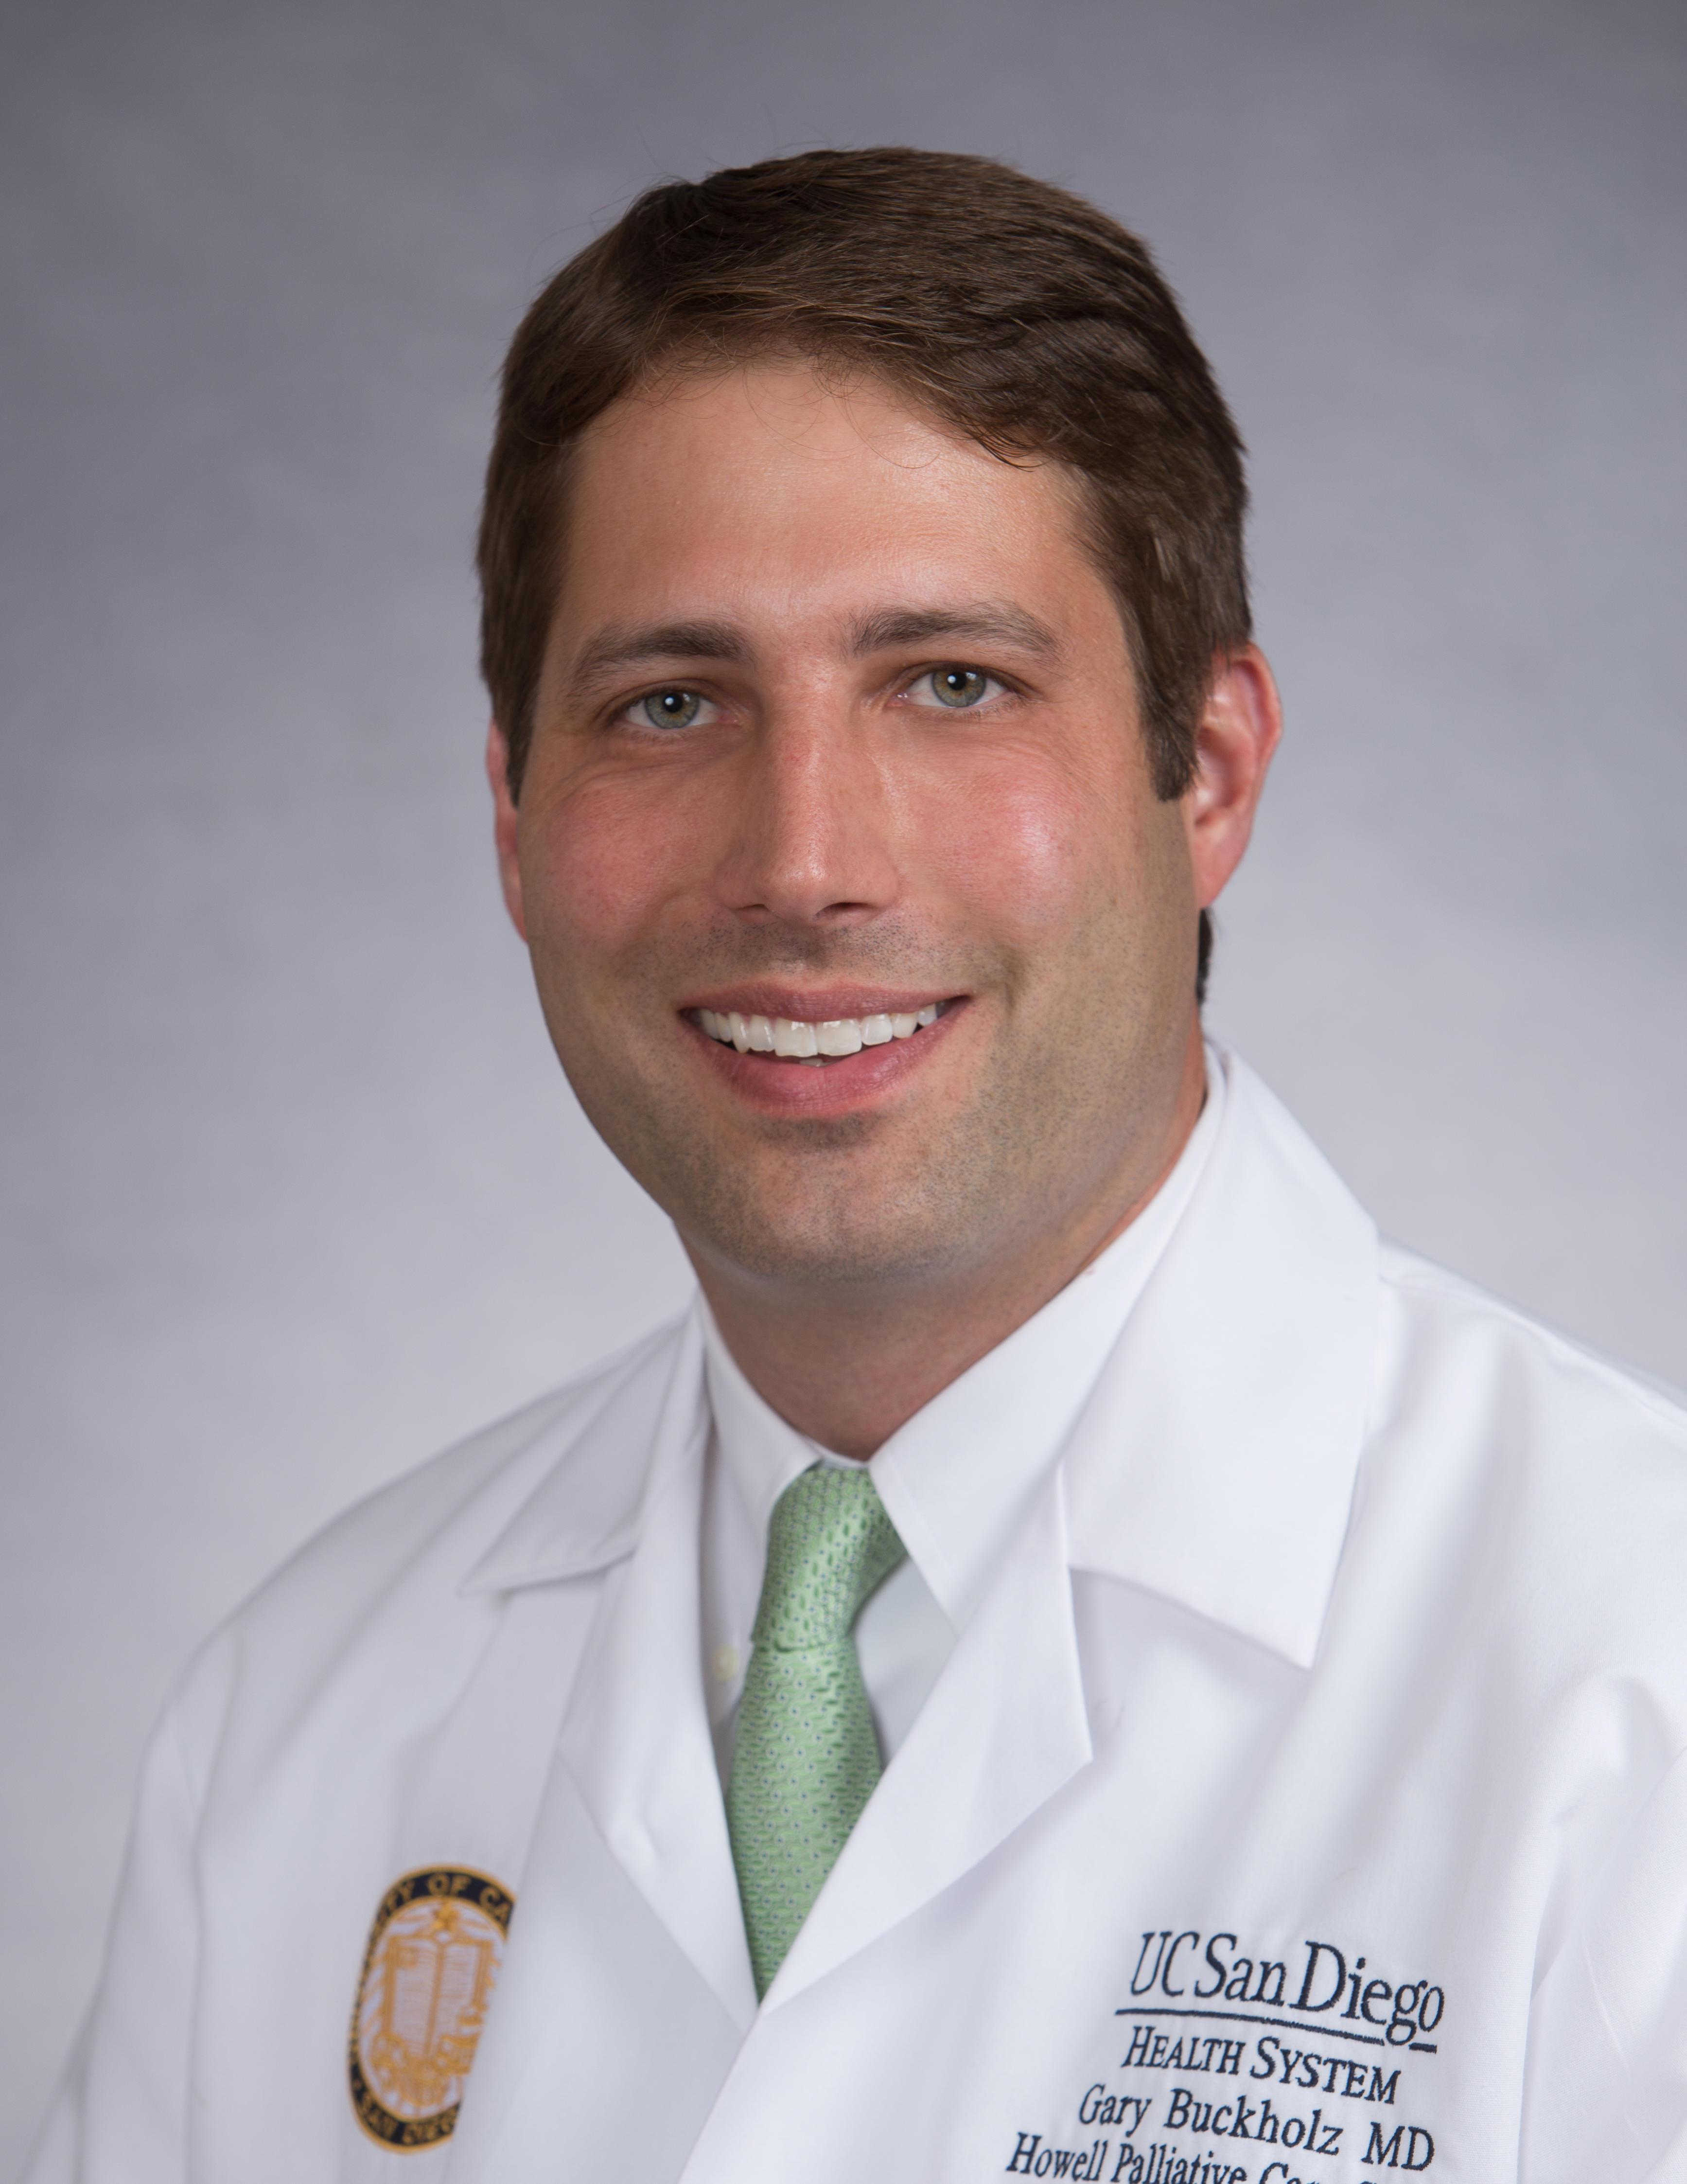 Gary Buckholz, MD Hospice